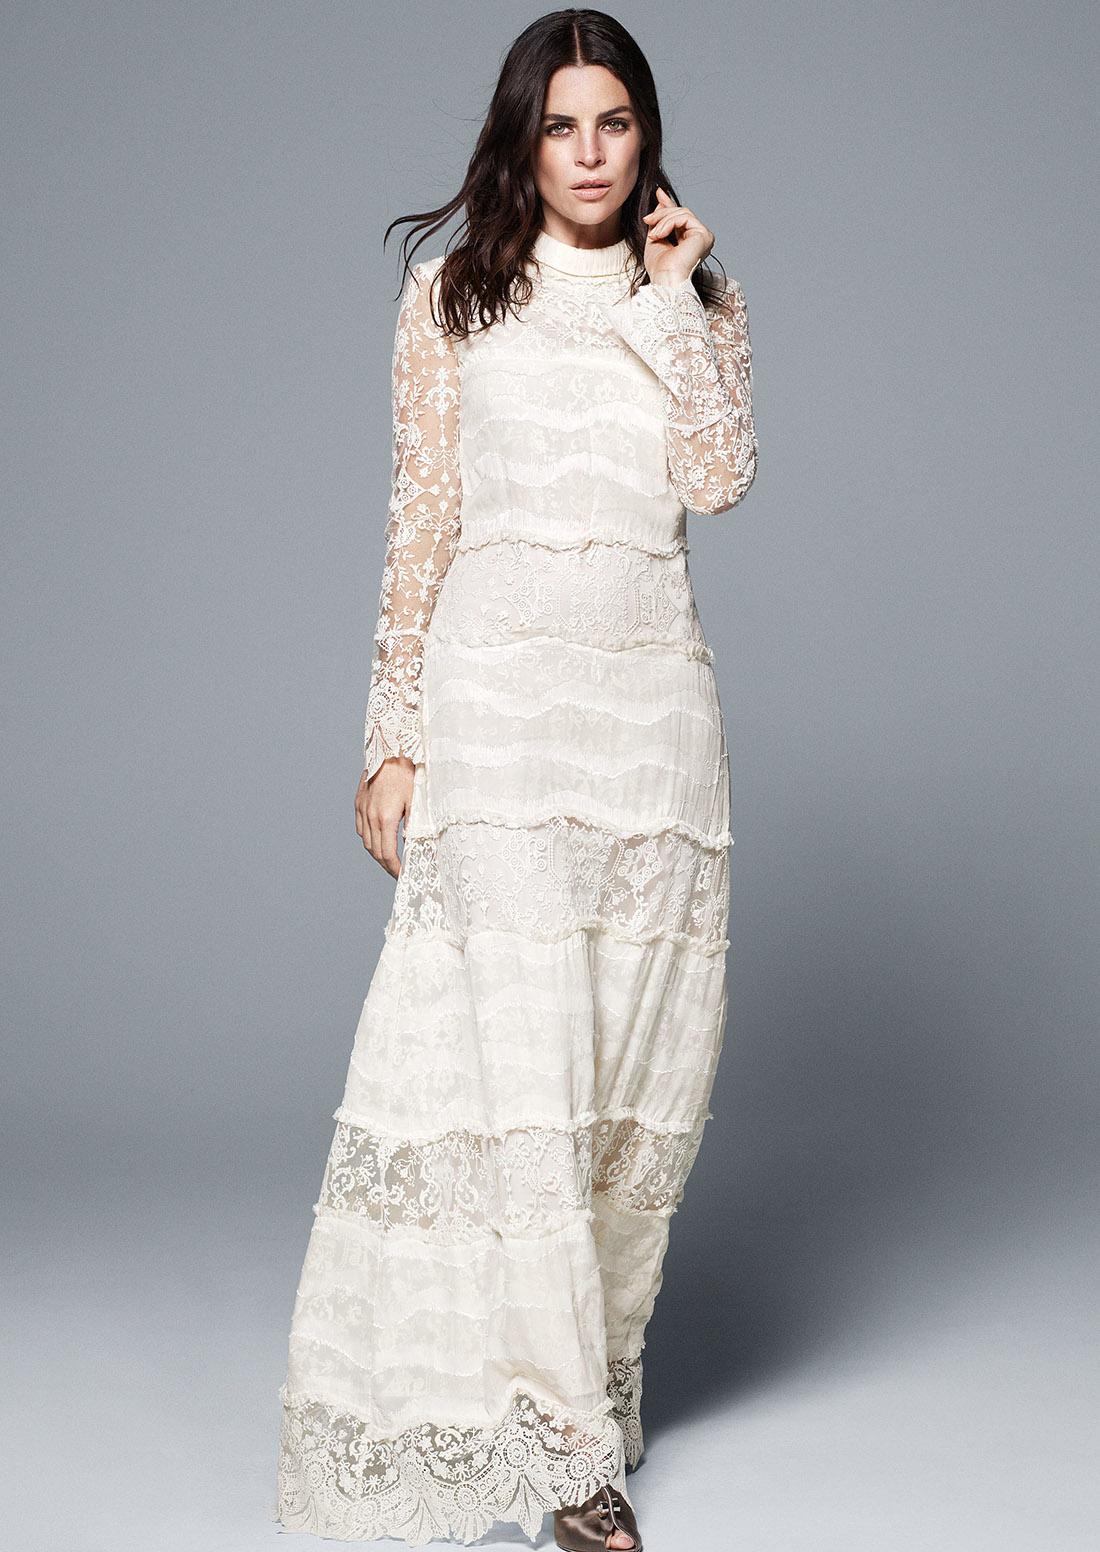 hm-bridal-collection-4